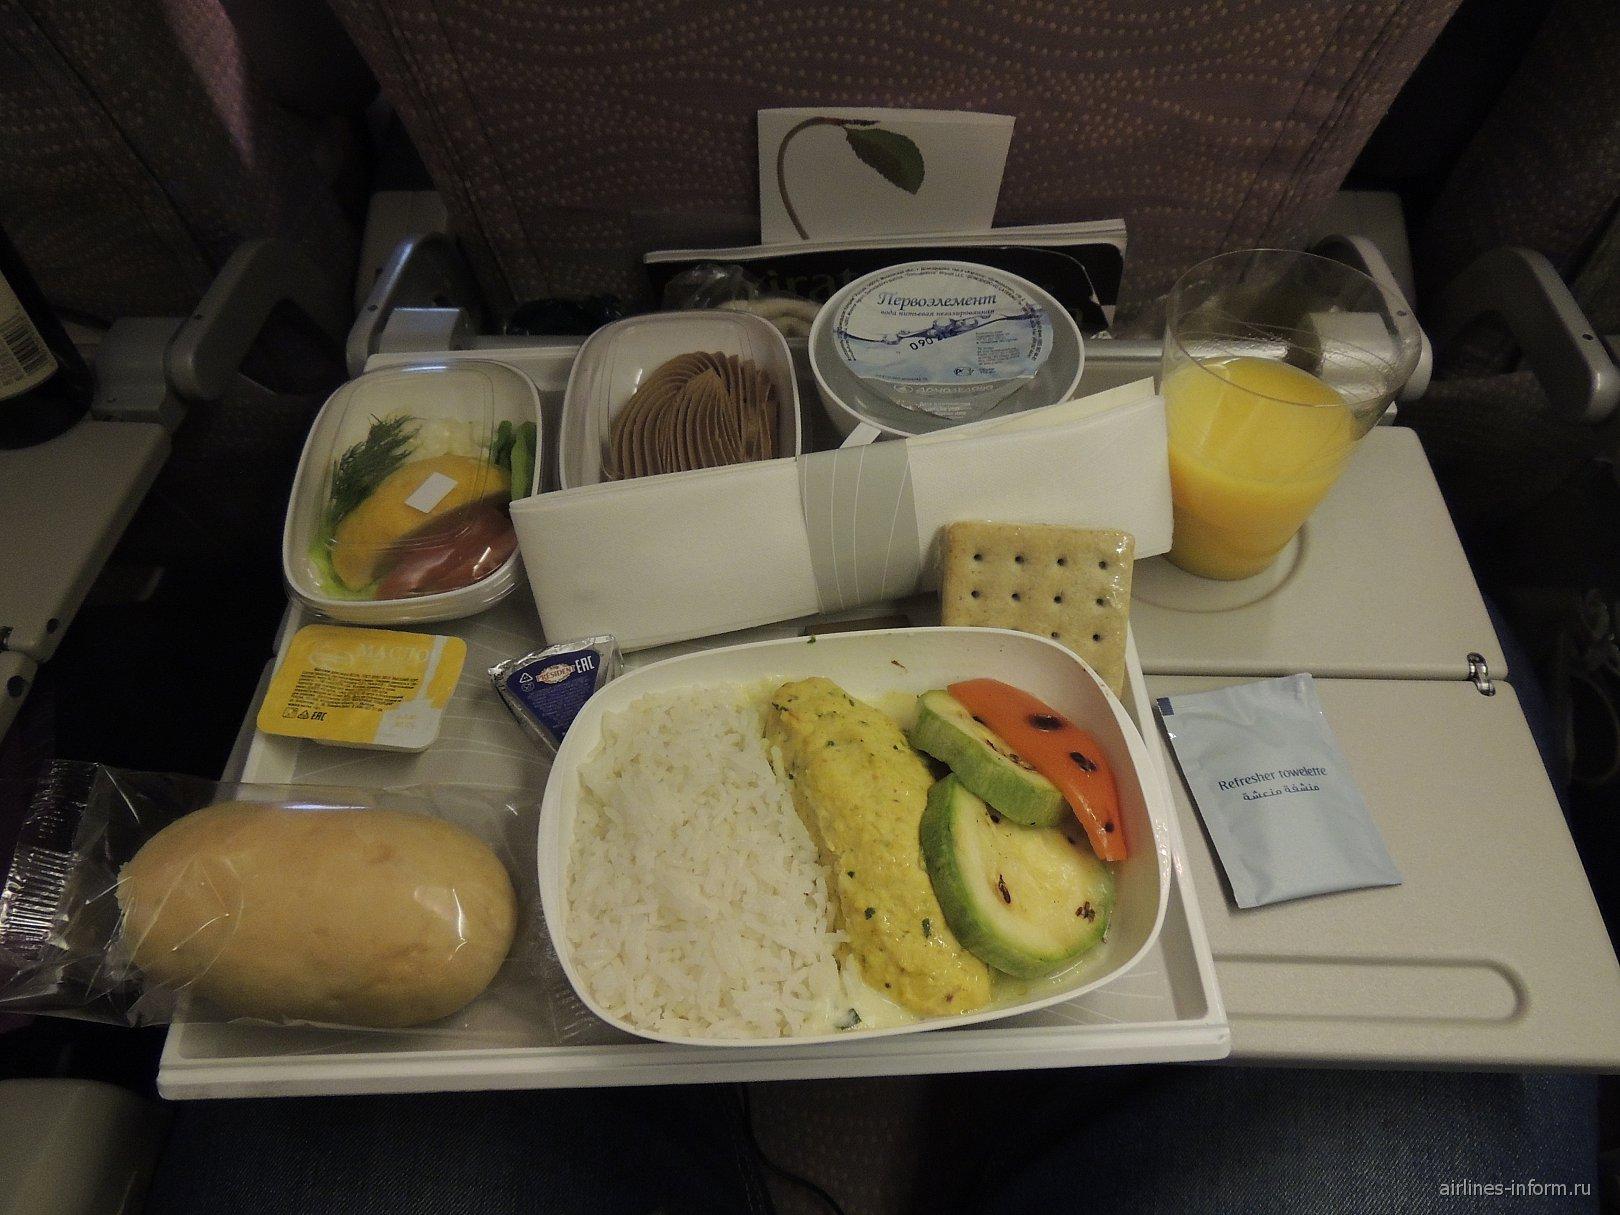 Бортпитание на рейсе Москва-Дубай авиакомпании Emirates